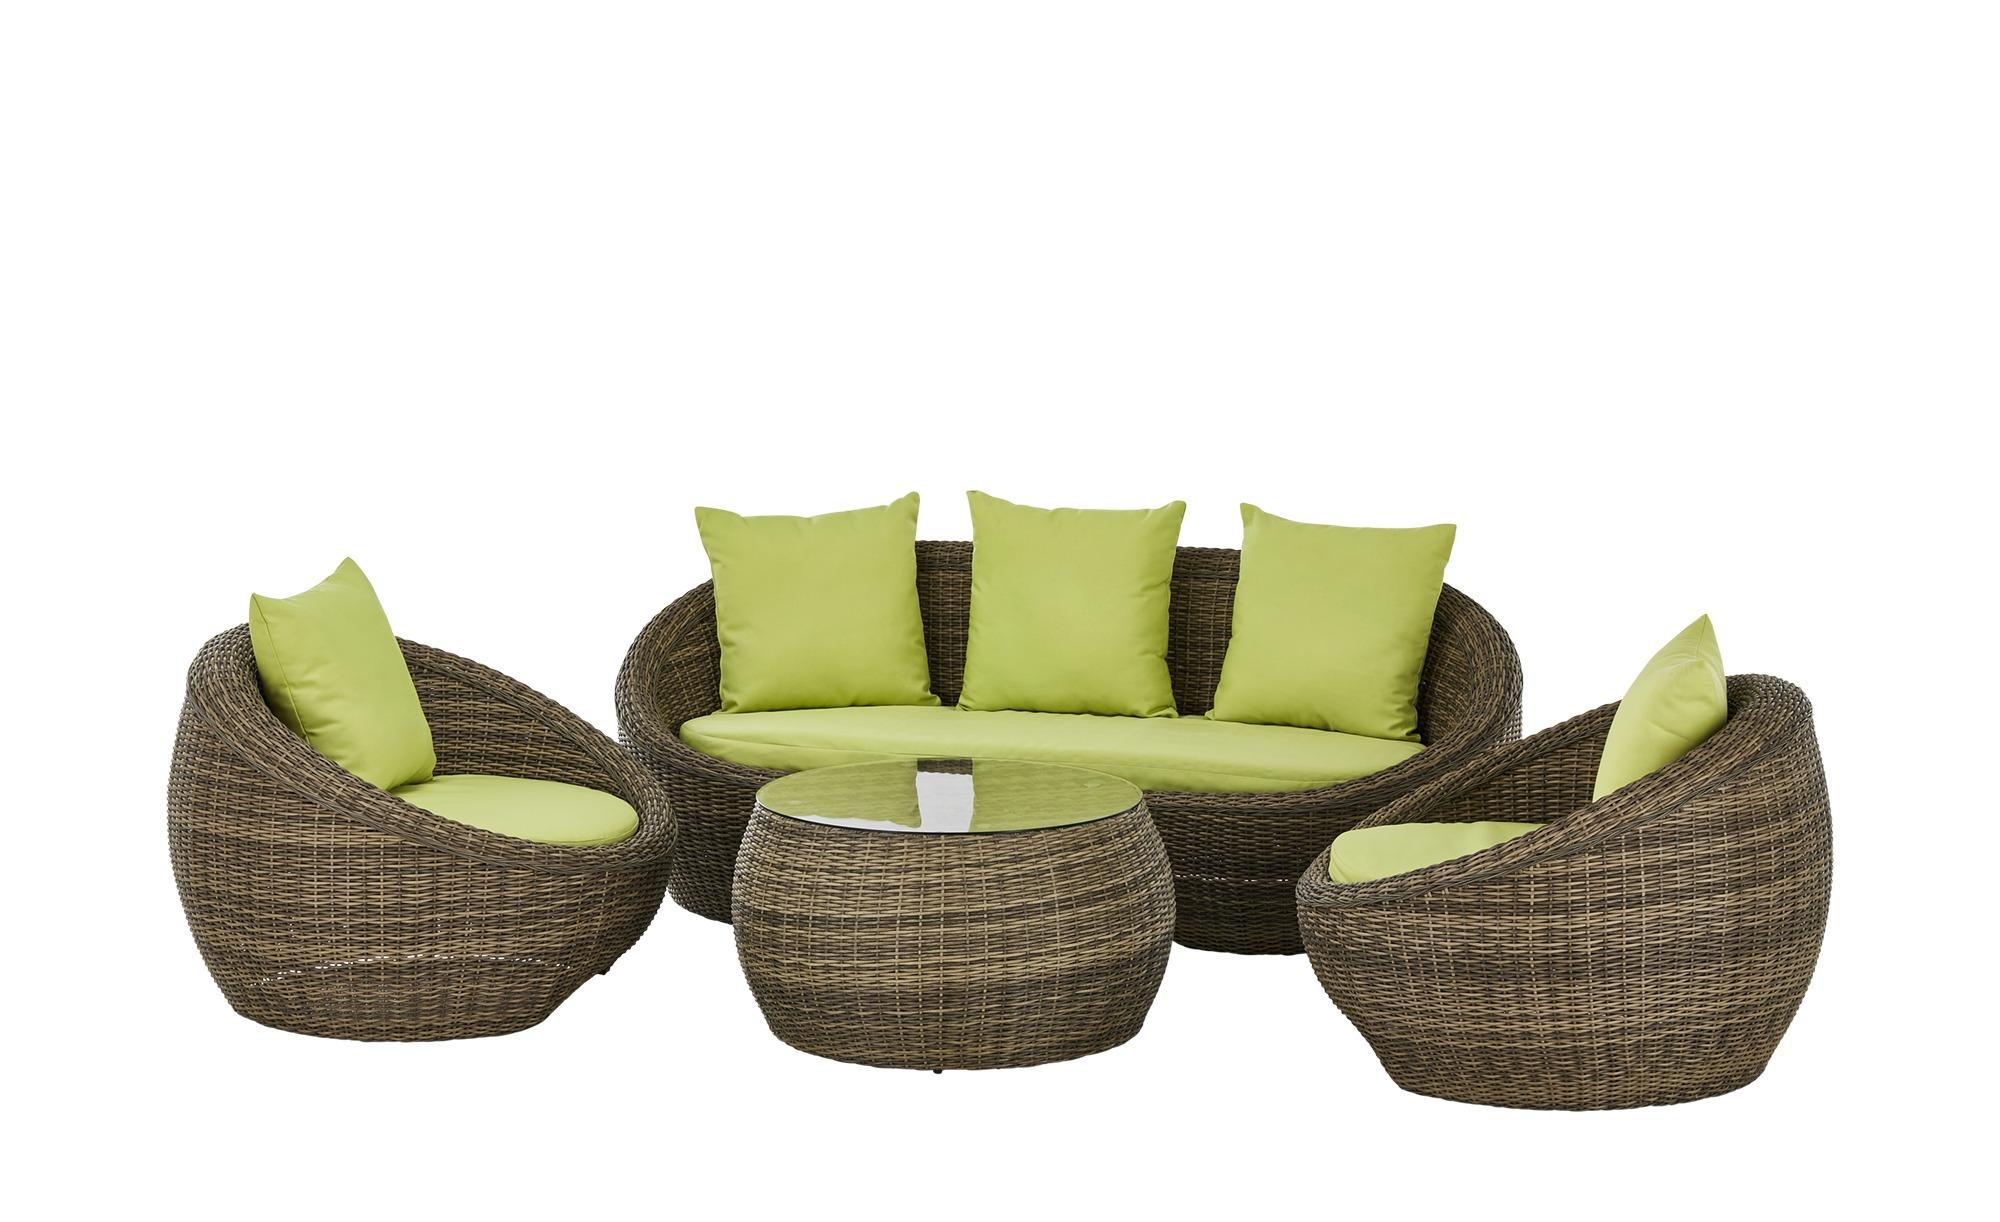 Loungeset  Cremona ¦ braun ¦ Aluminium pulverbeschichtet/ PE-Geflecht Garten > Gartenmöbel > Gartenmöbel Sets - Höffner